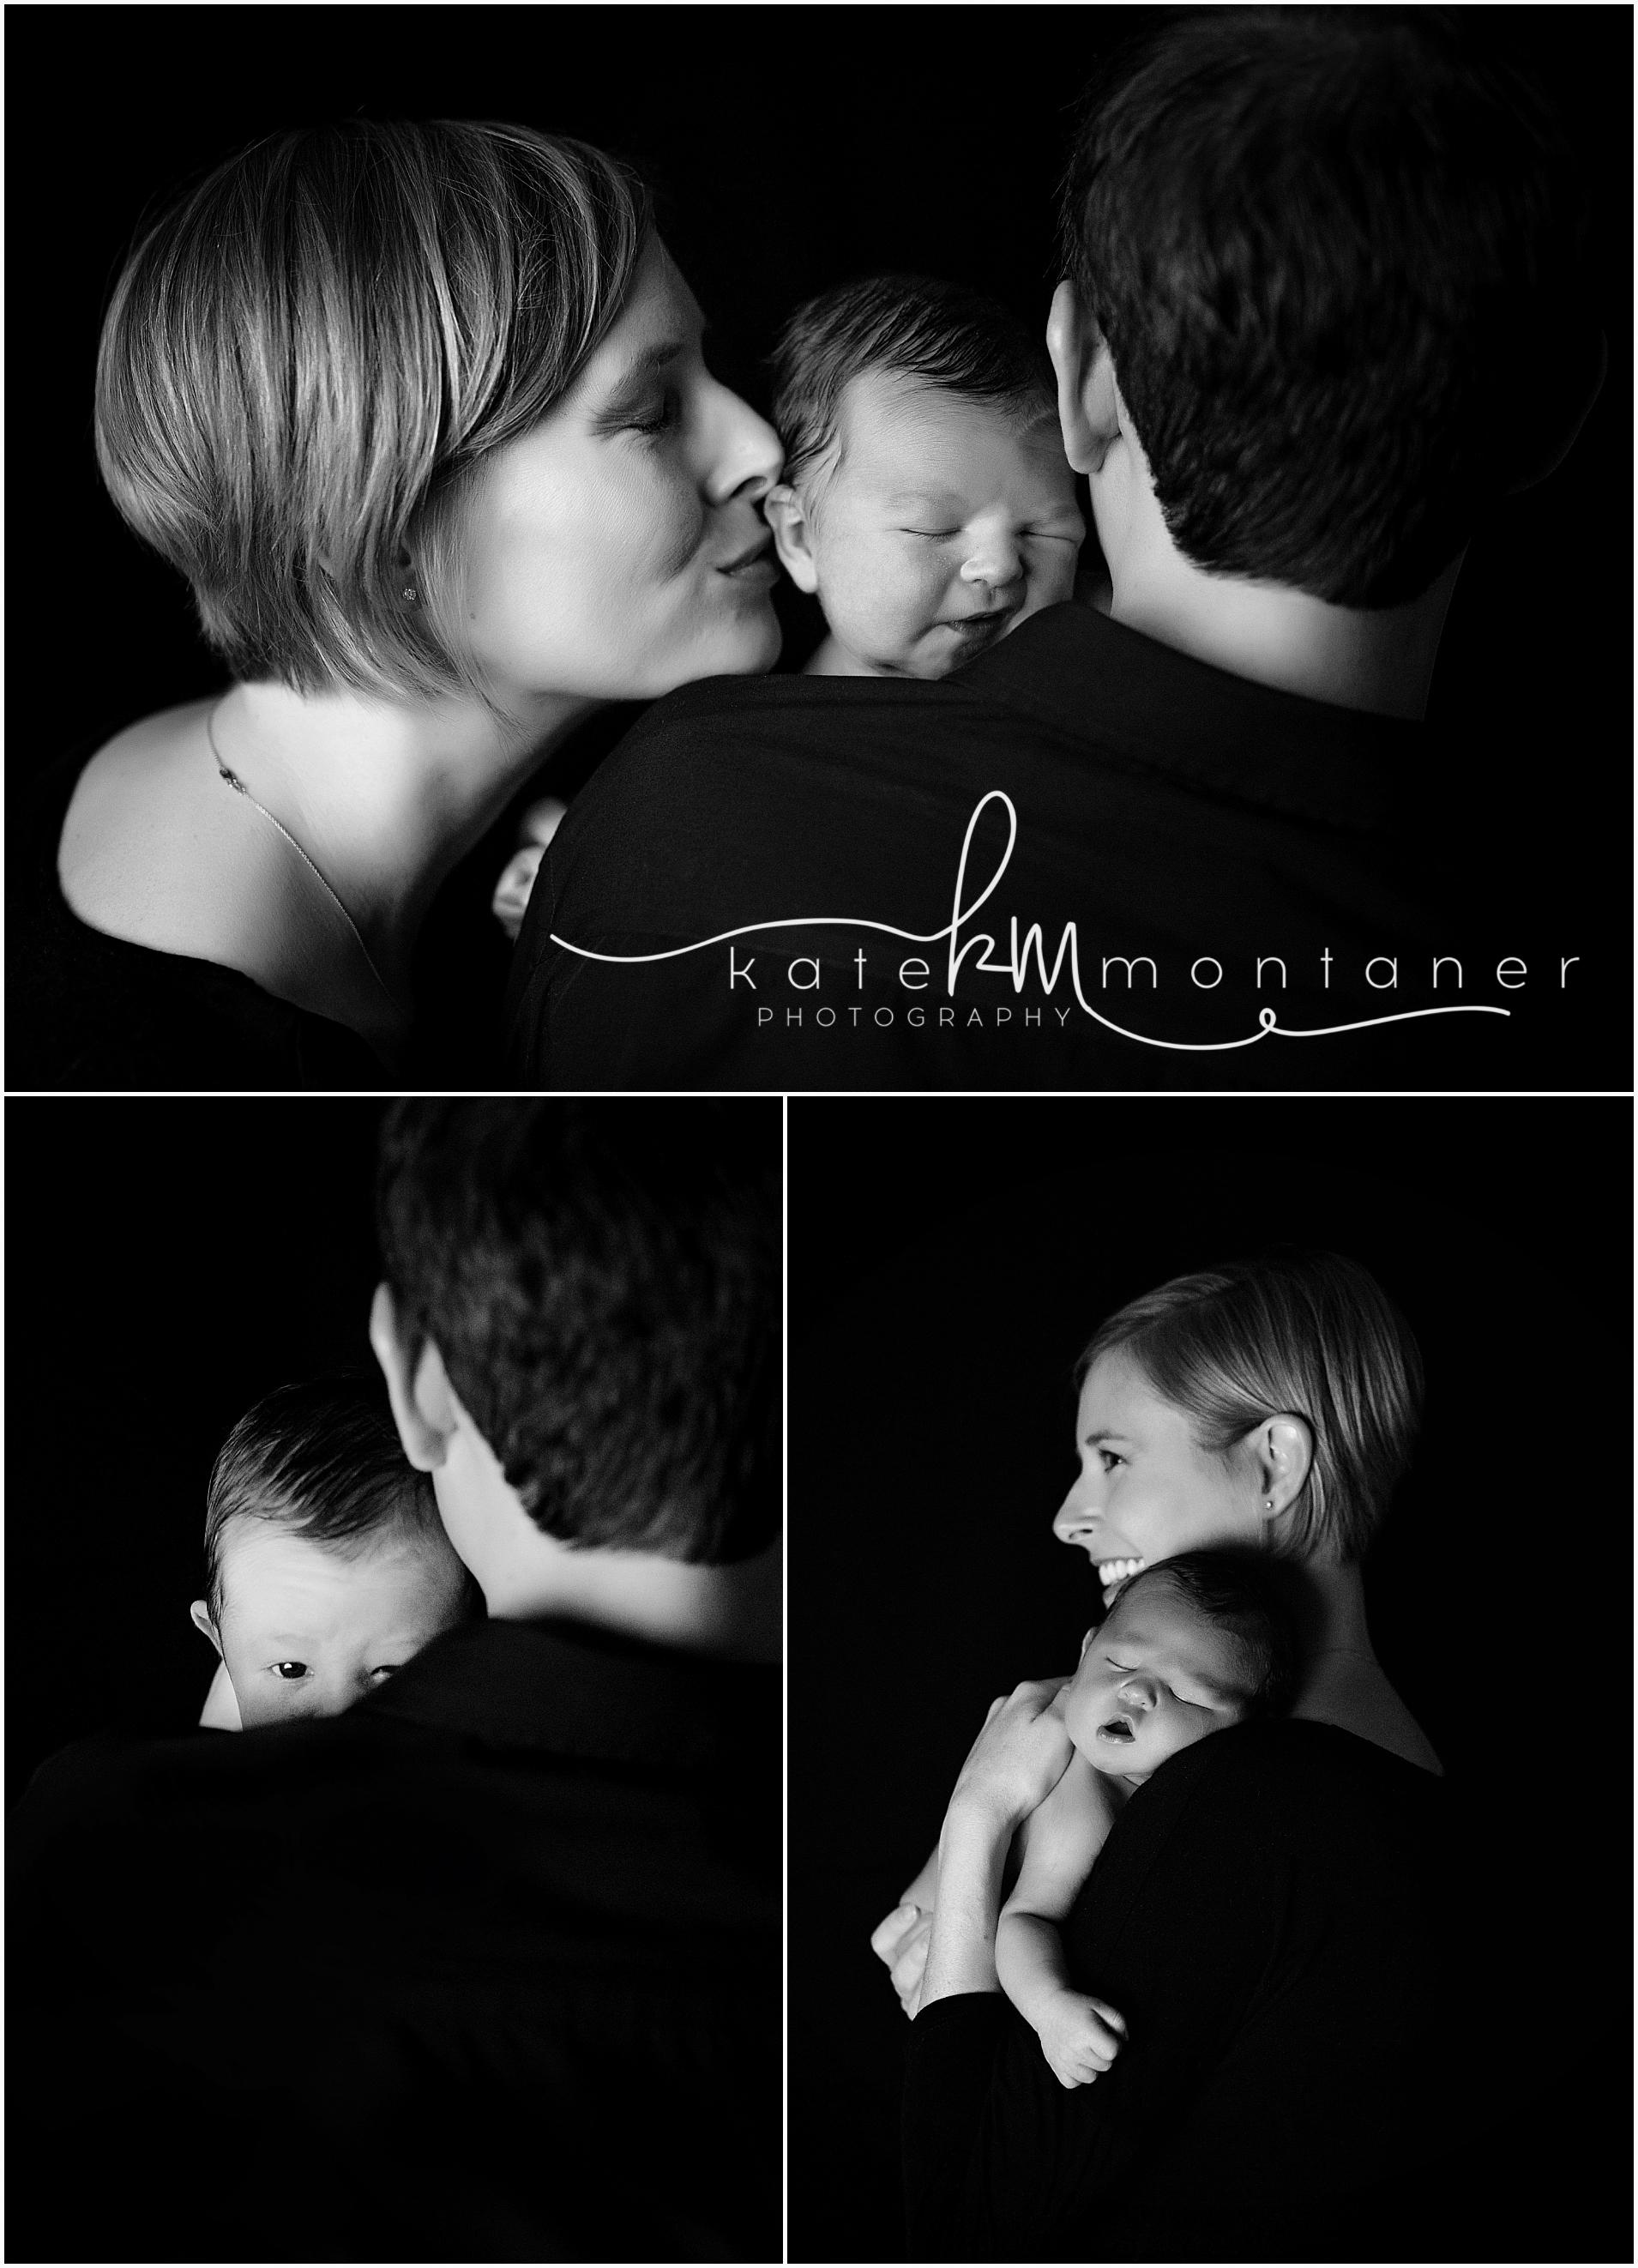 Mom! More kisses? :)